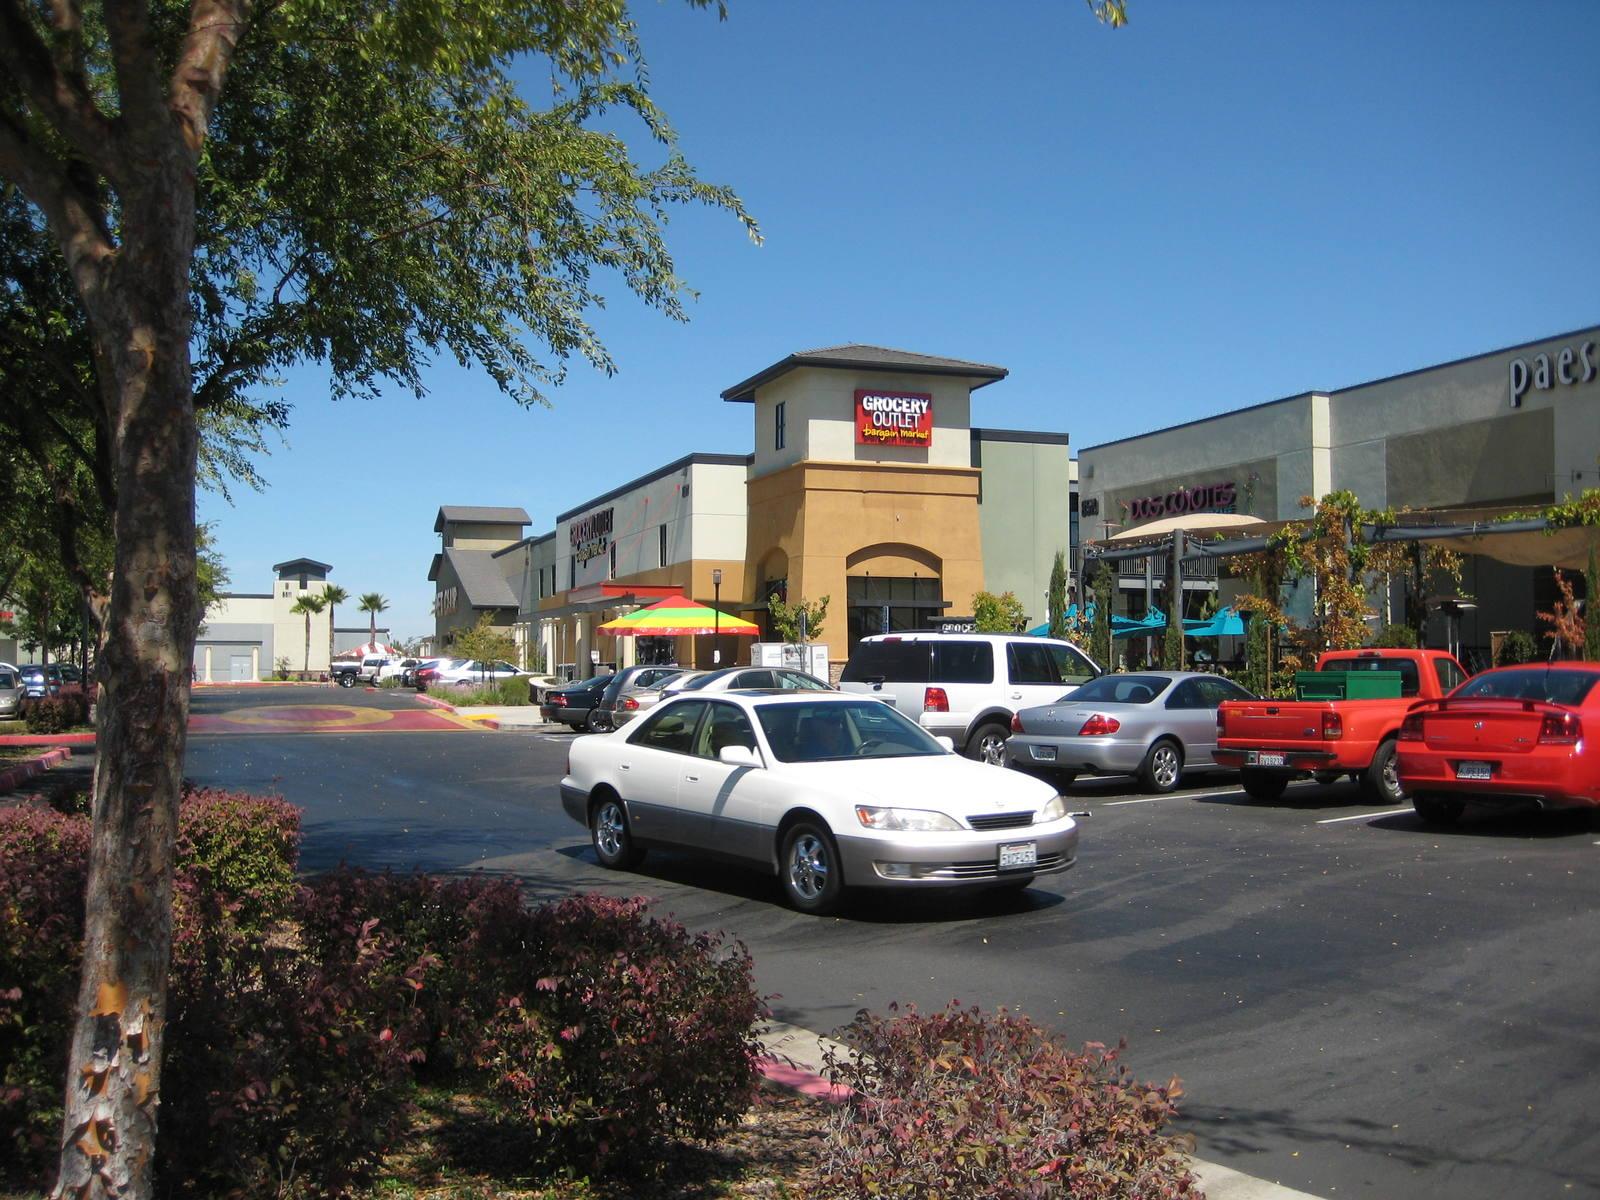 CBRE RetailElk Grove Marketplace8507, 8509, 8511, 8515, 8517 & 8519 Bond Rd  Photo